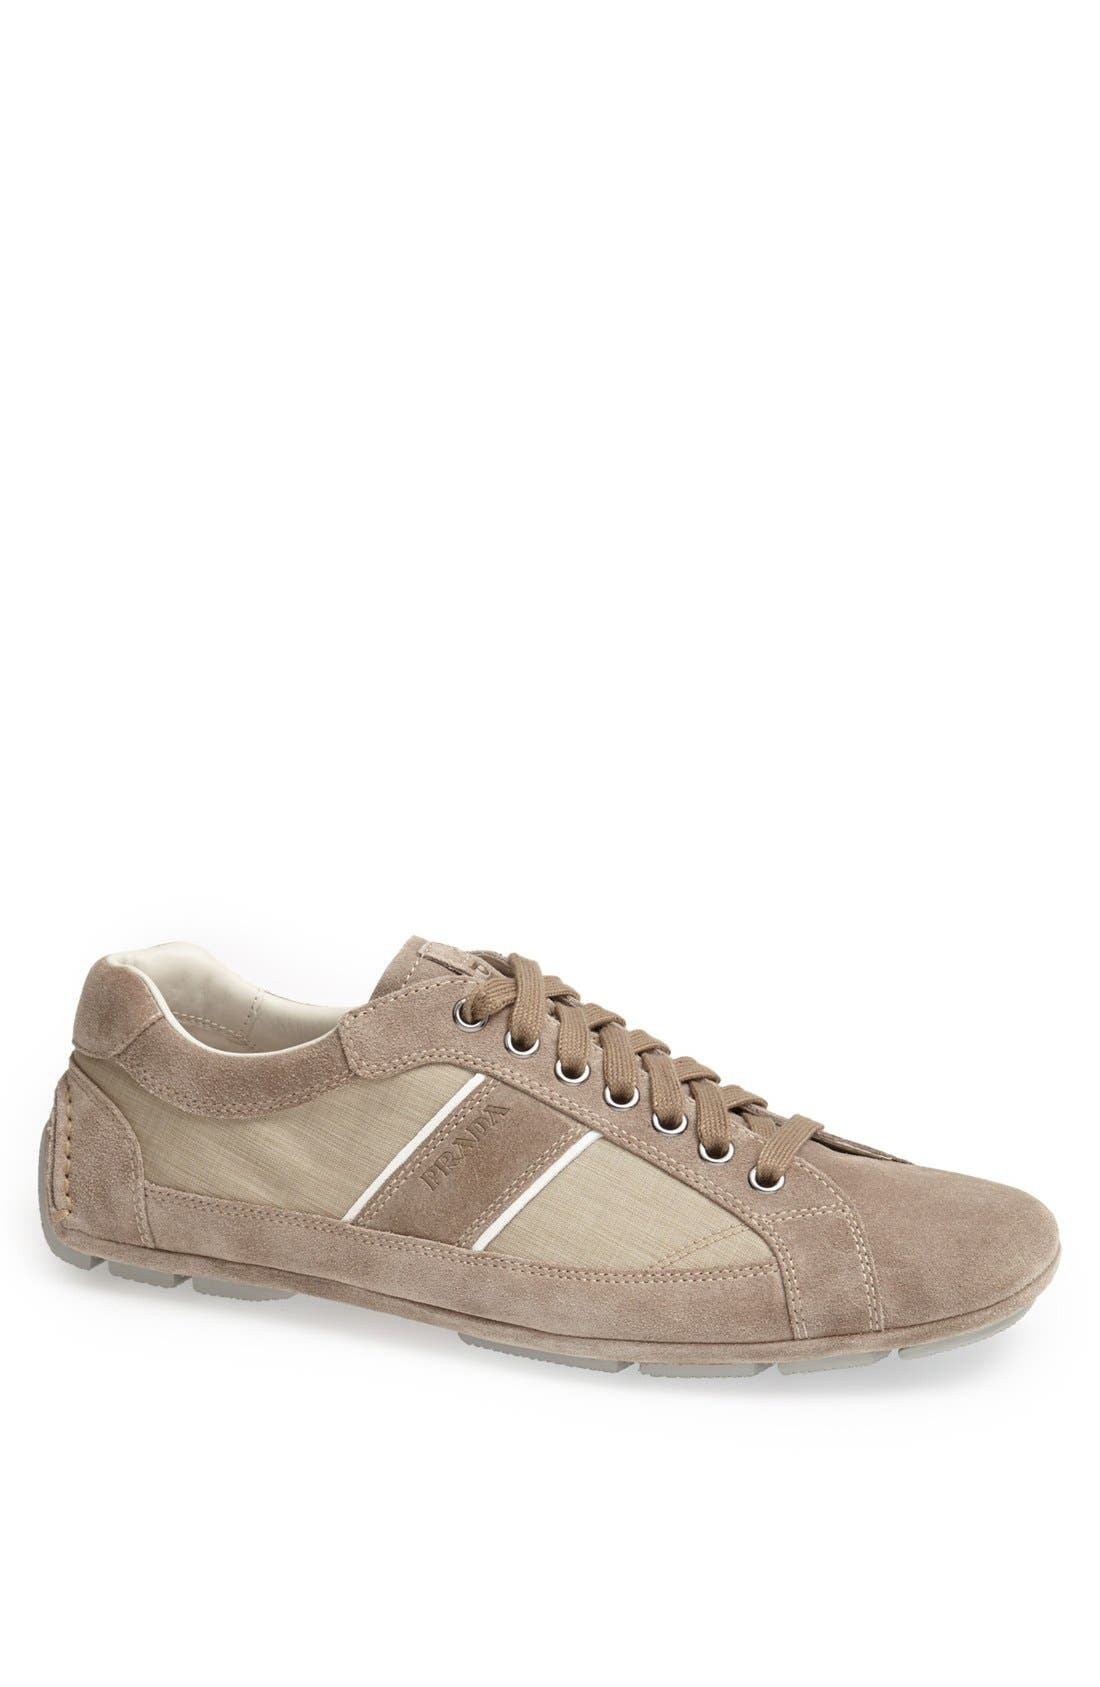 Alternate Image 1 Selected - Prada Low Profile Suede and Nylon Sneaker